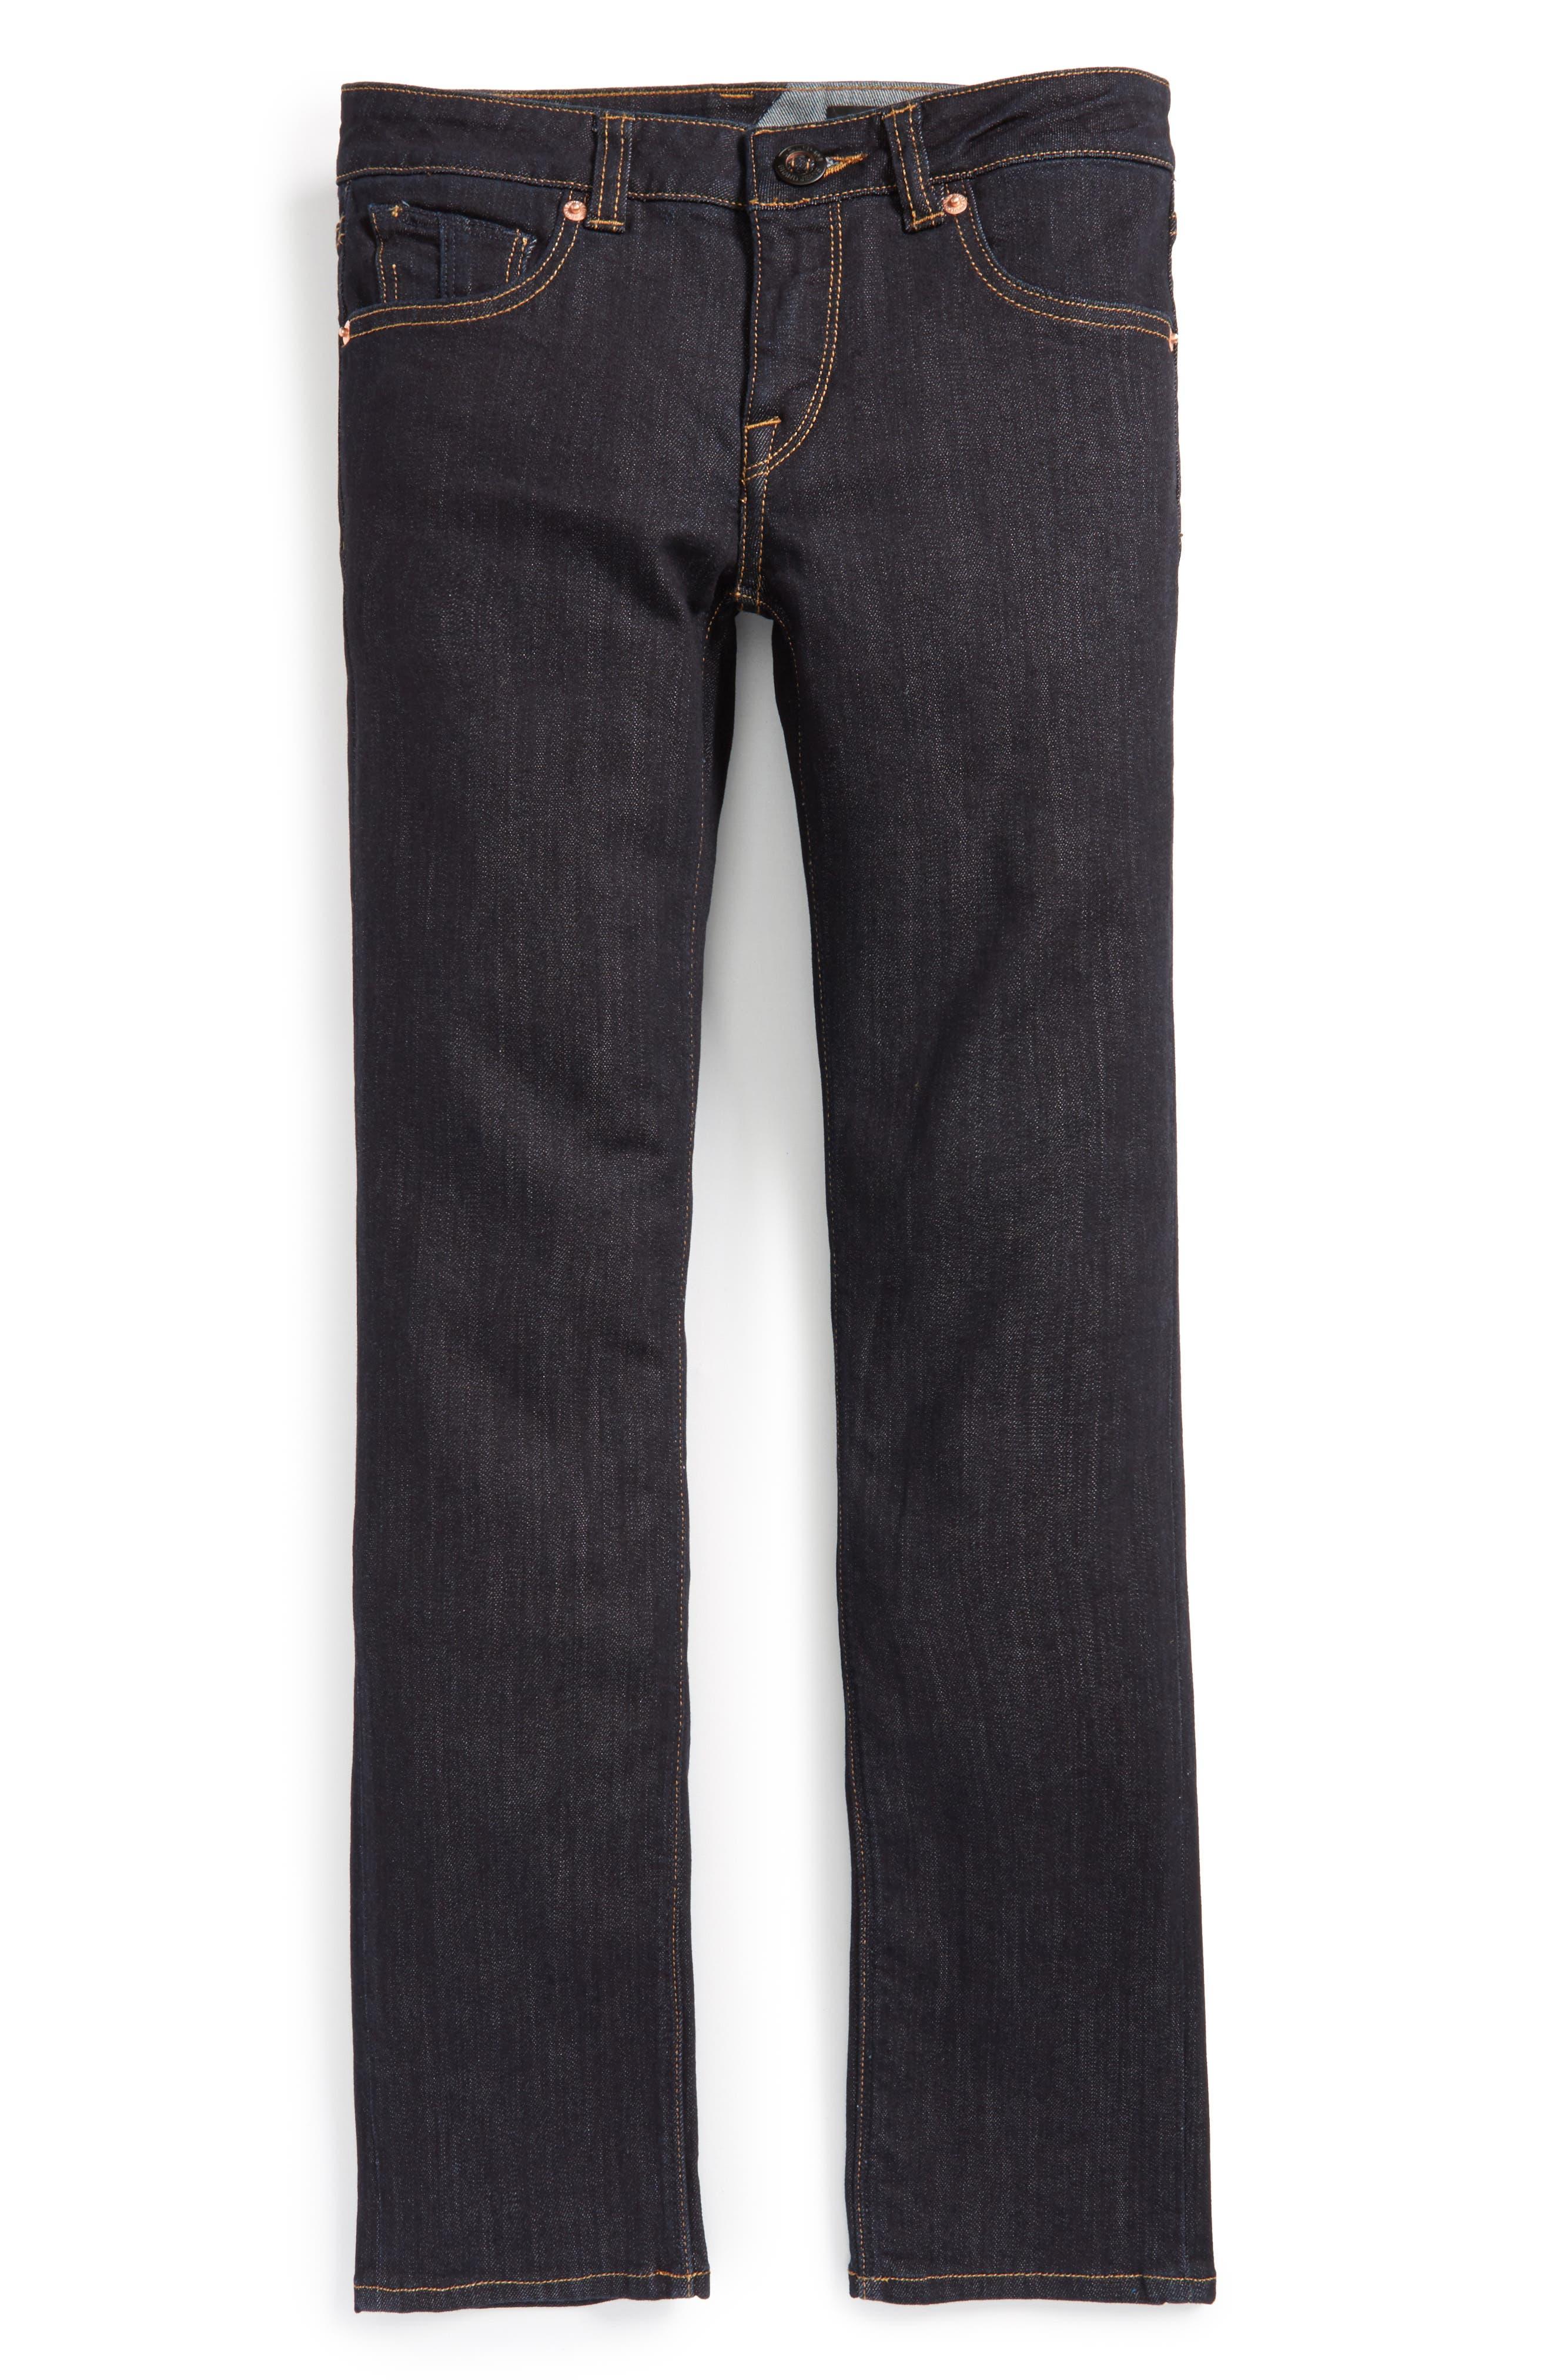 Vorta Slim Fit Jeans,                             Alternate thumbnail 6, color,                             BLUE RINSER